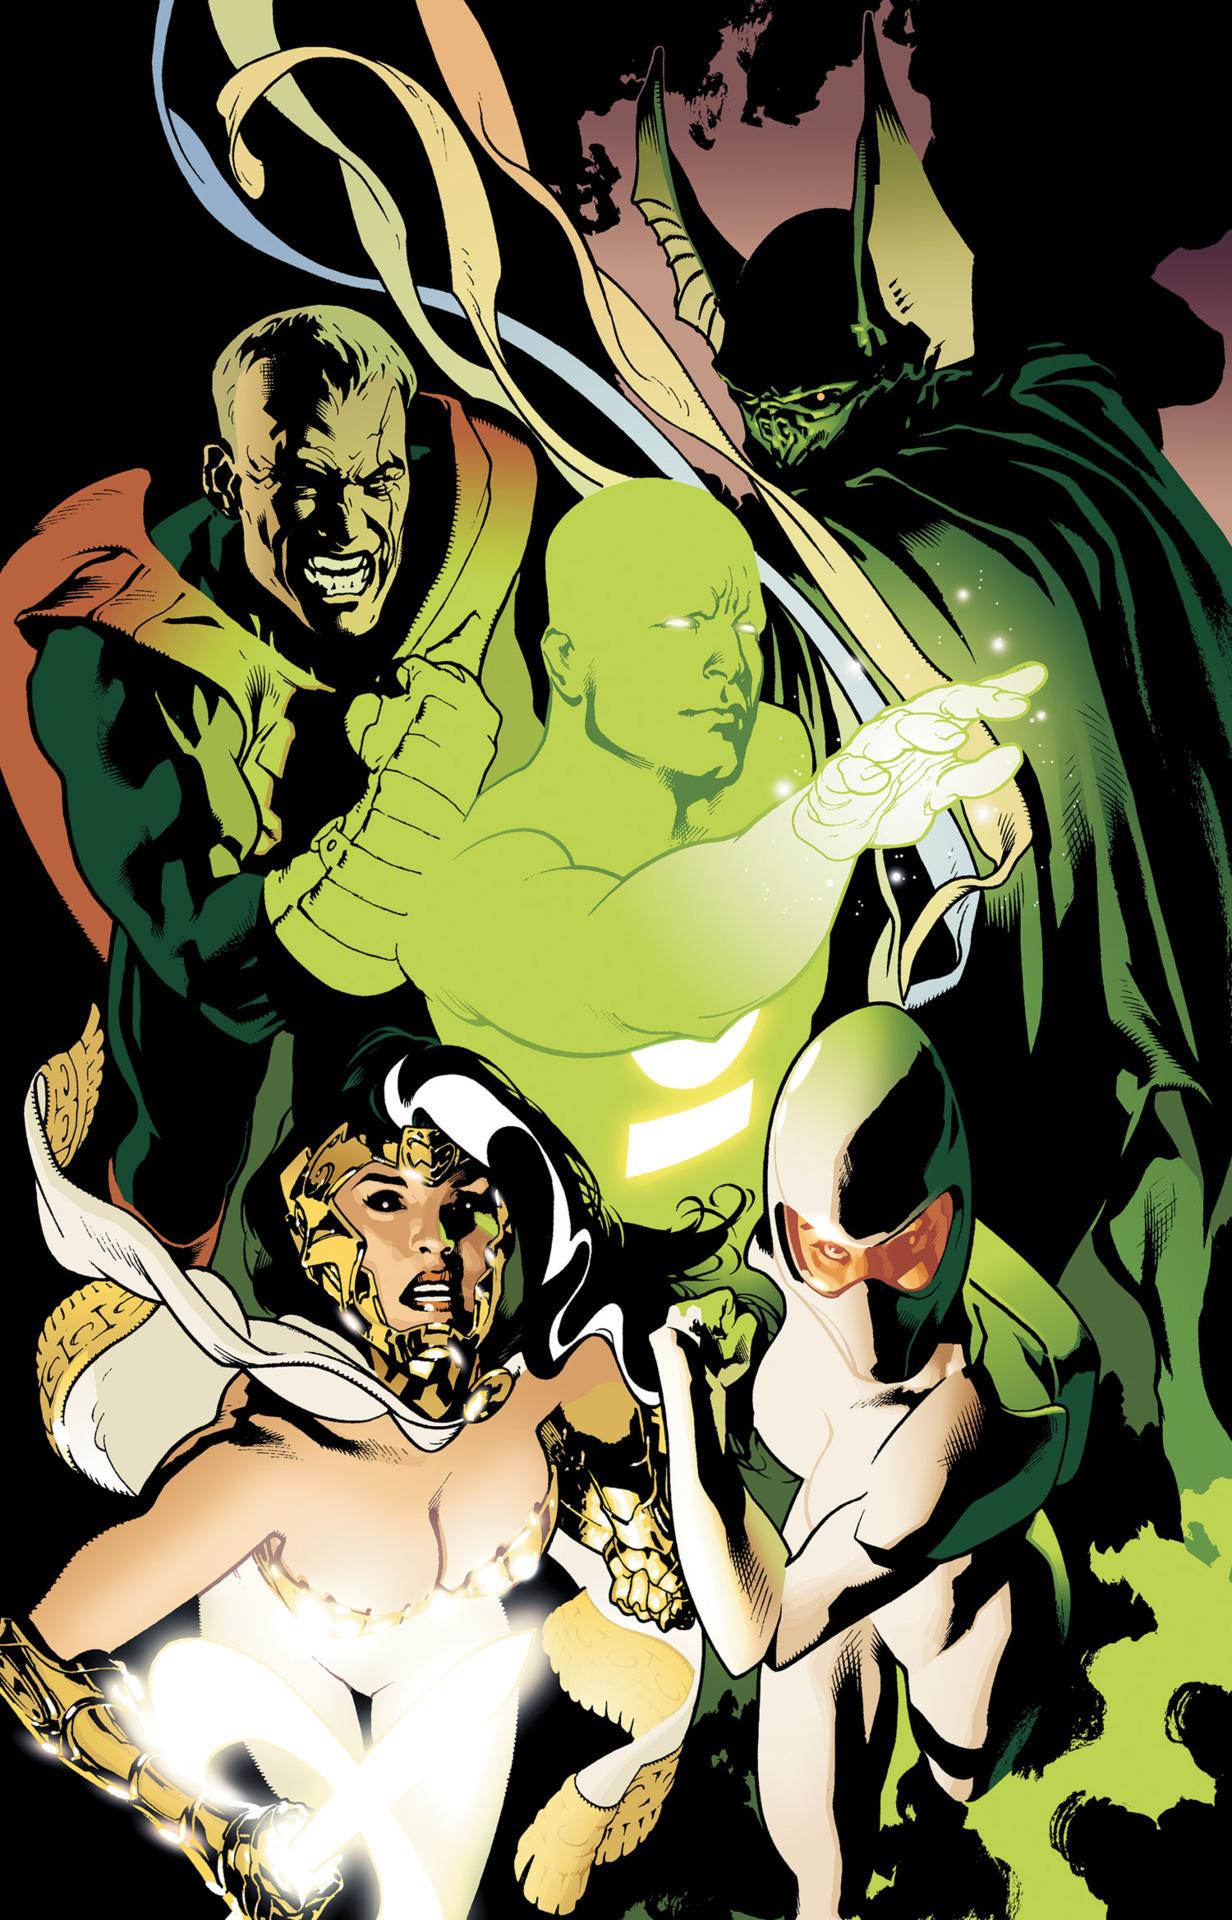 Justice League of America (Just Imagine)